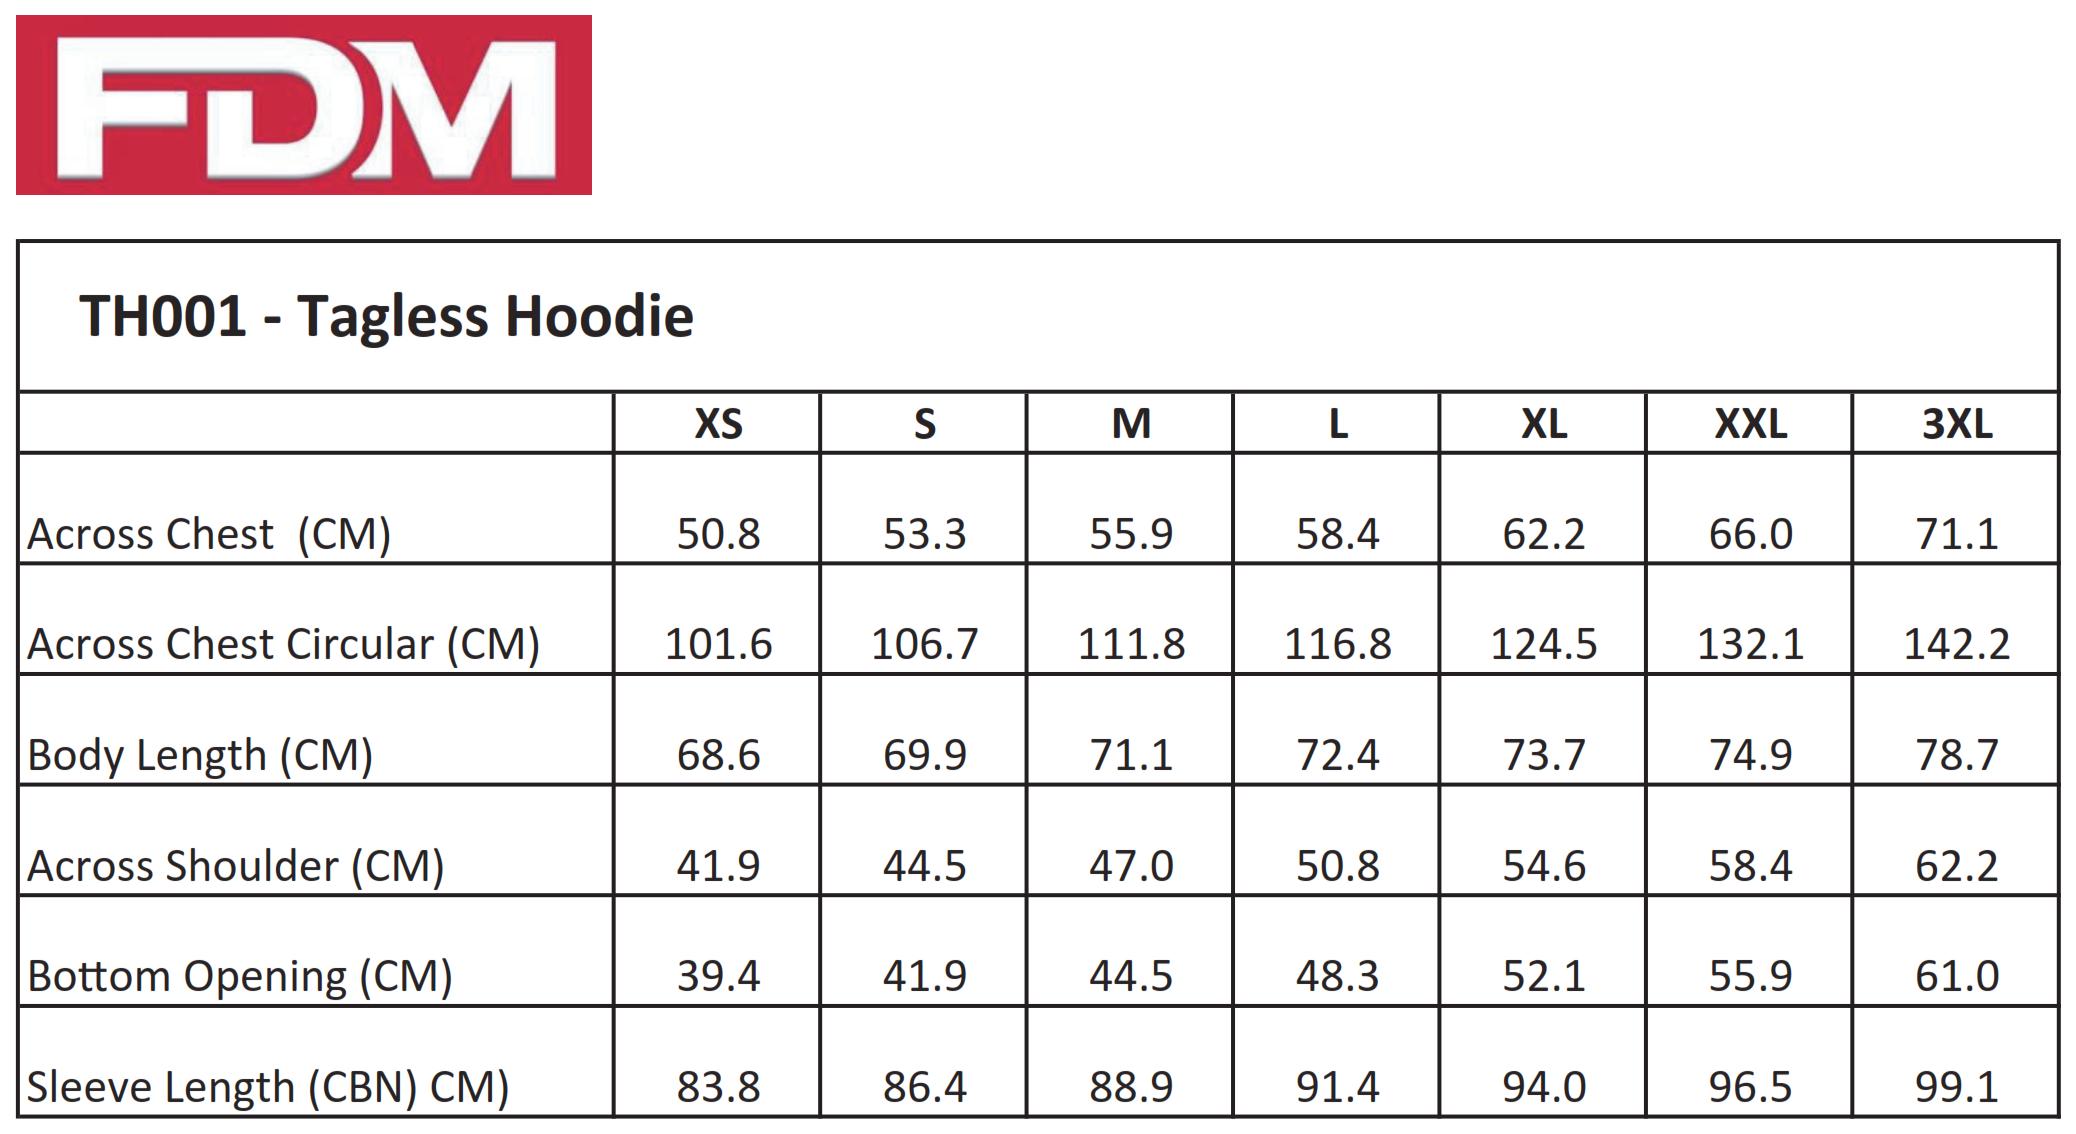 FDM: Unisex Tagless Hoodie TH001